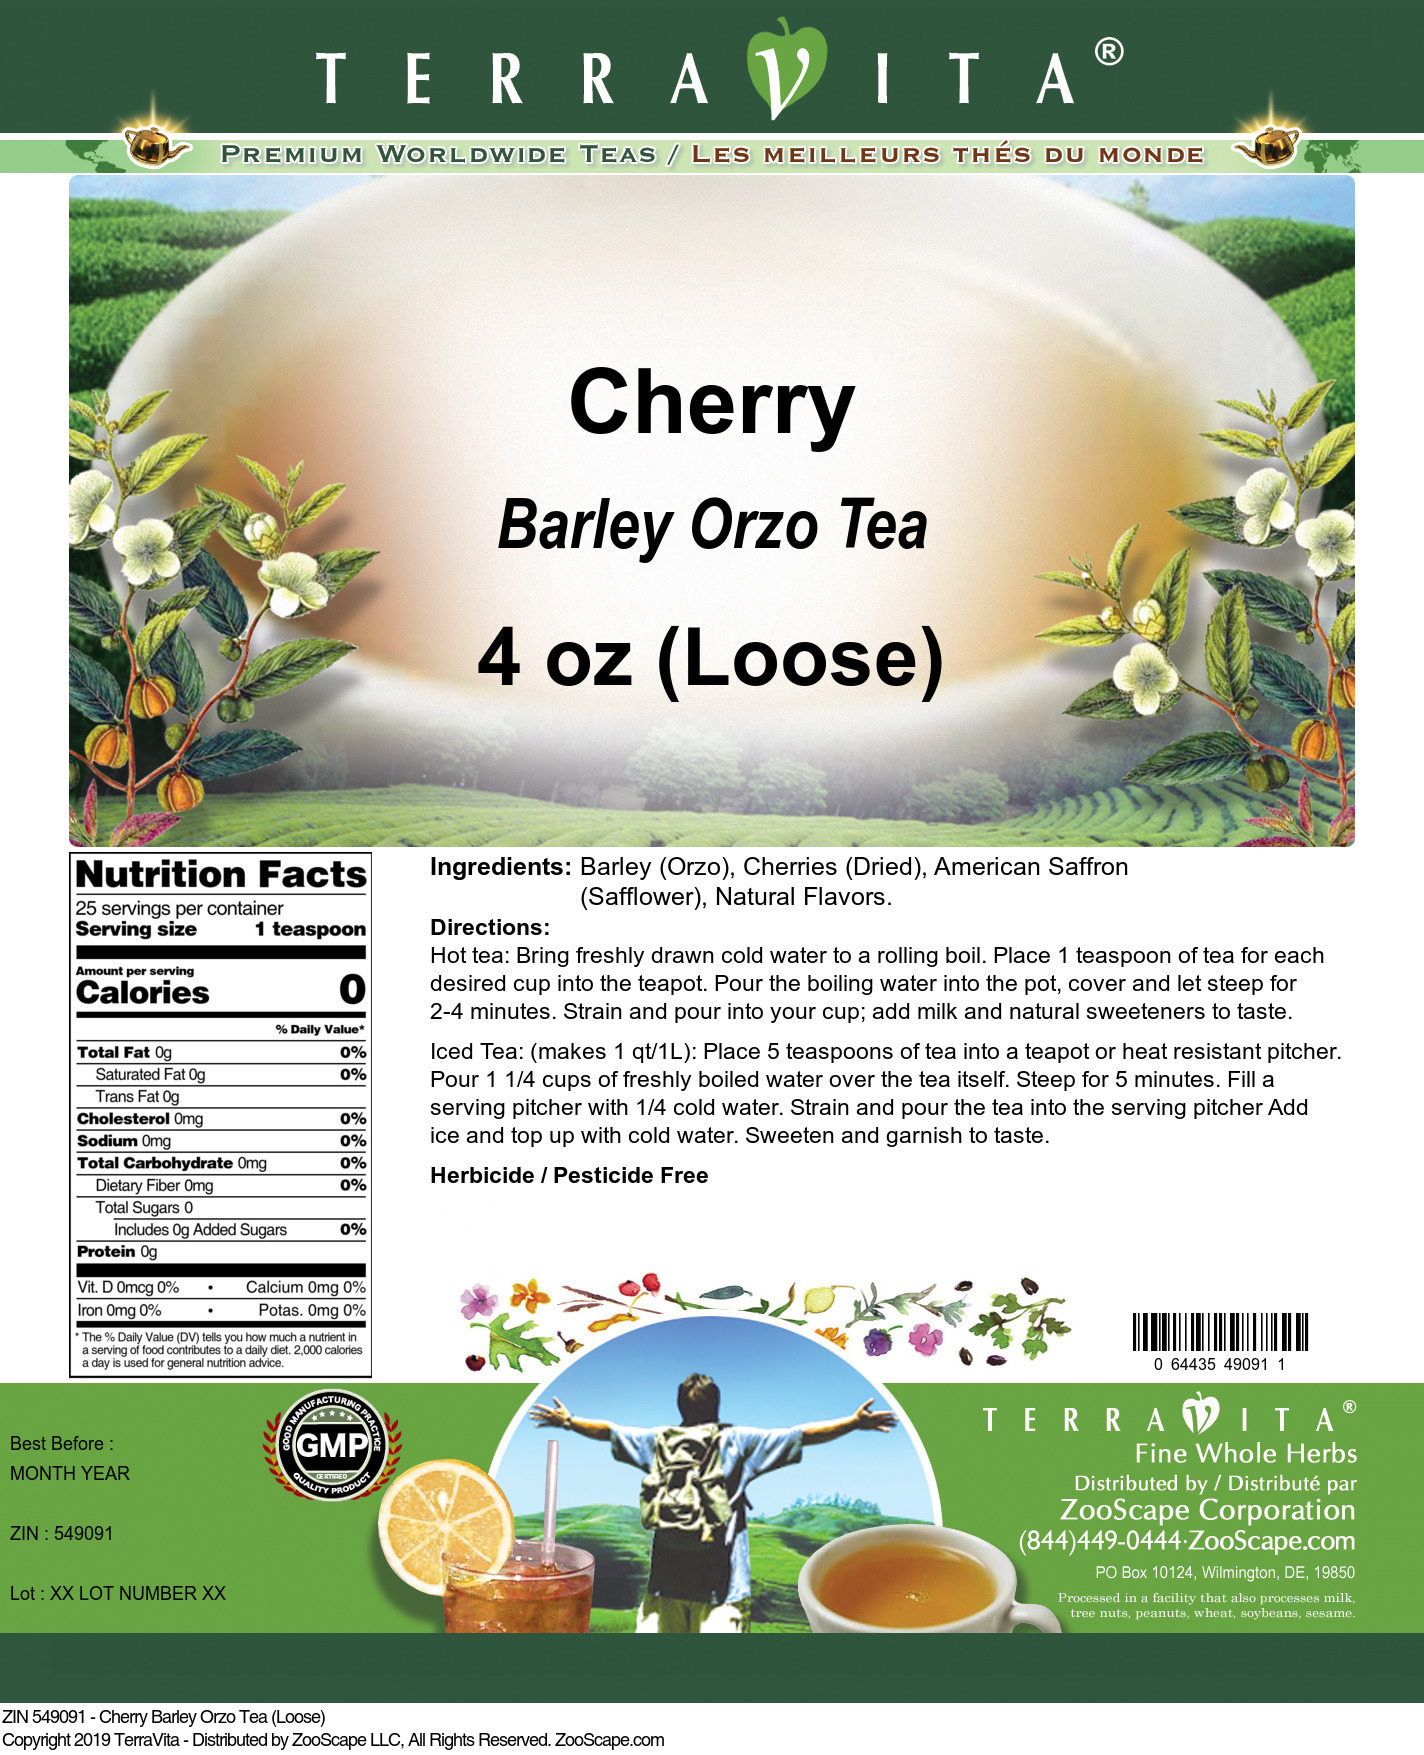 Cherry Barley Orzo Tea (Loose)